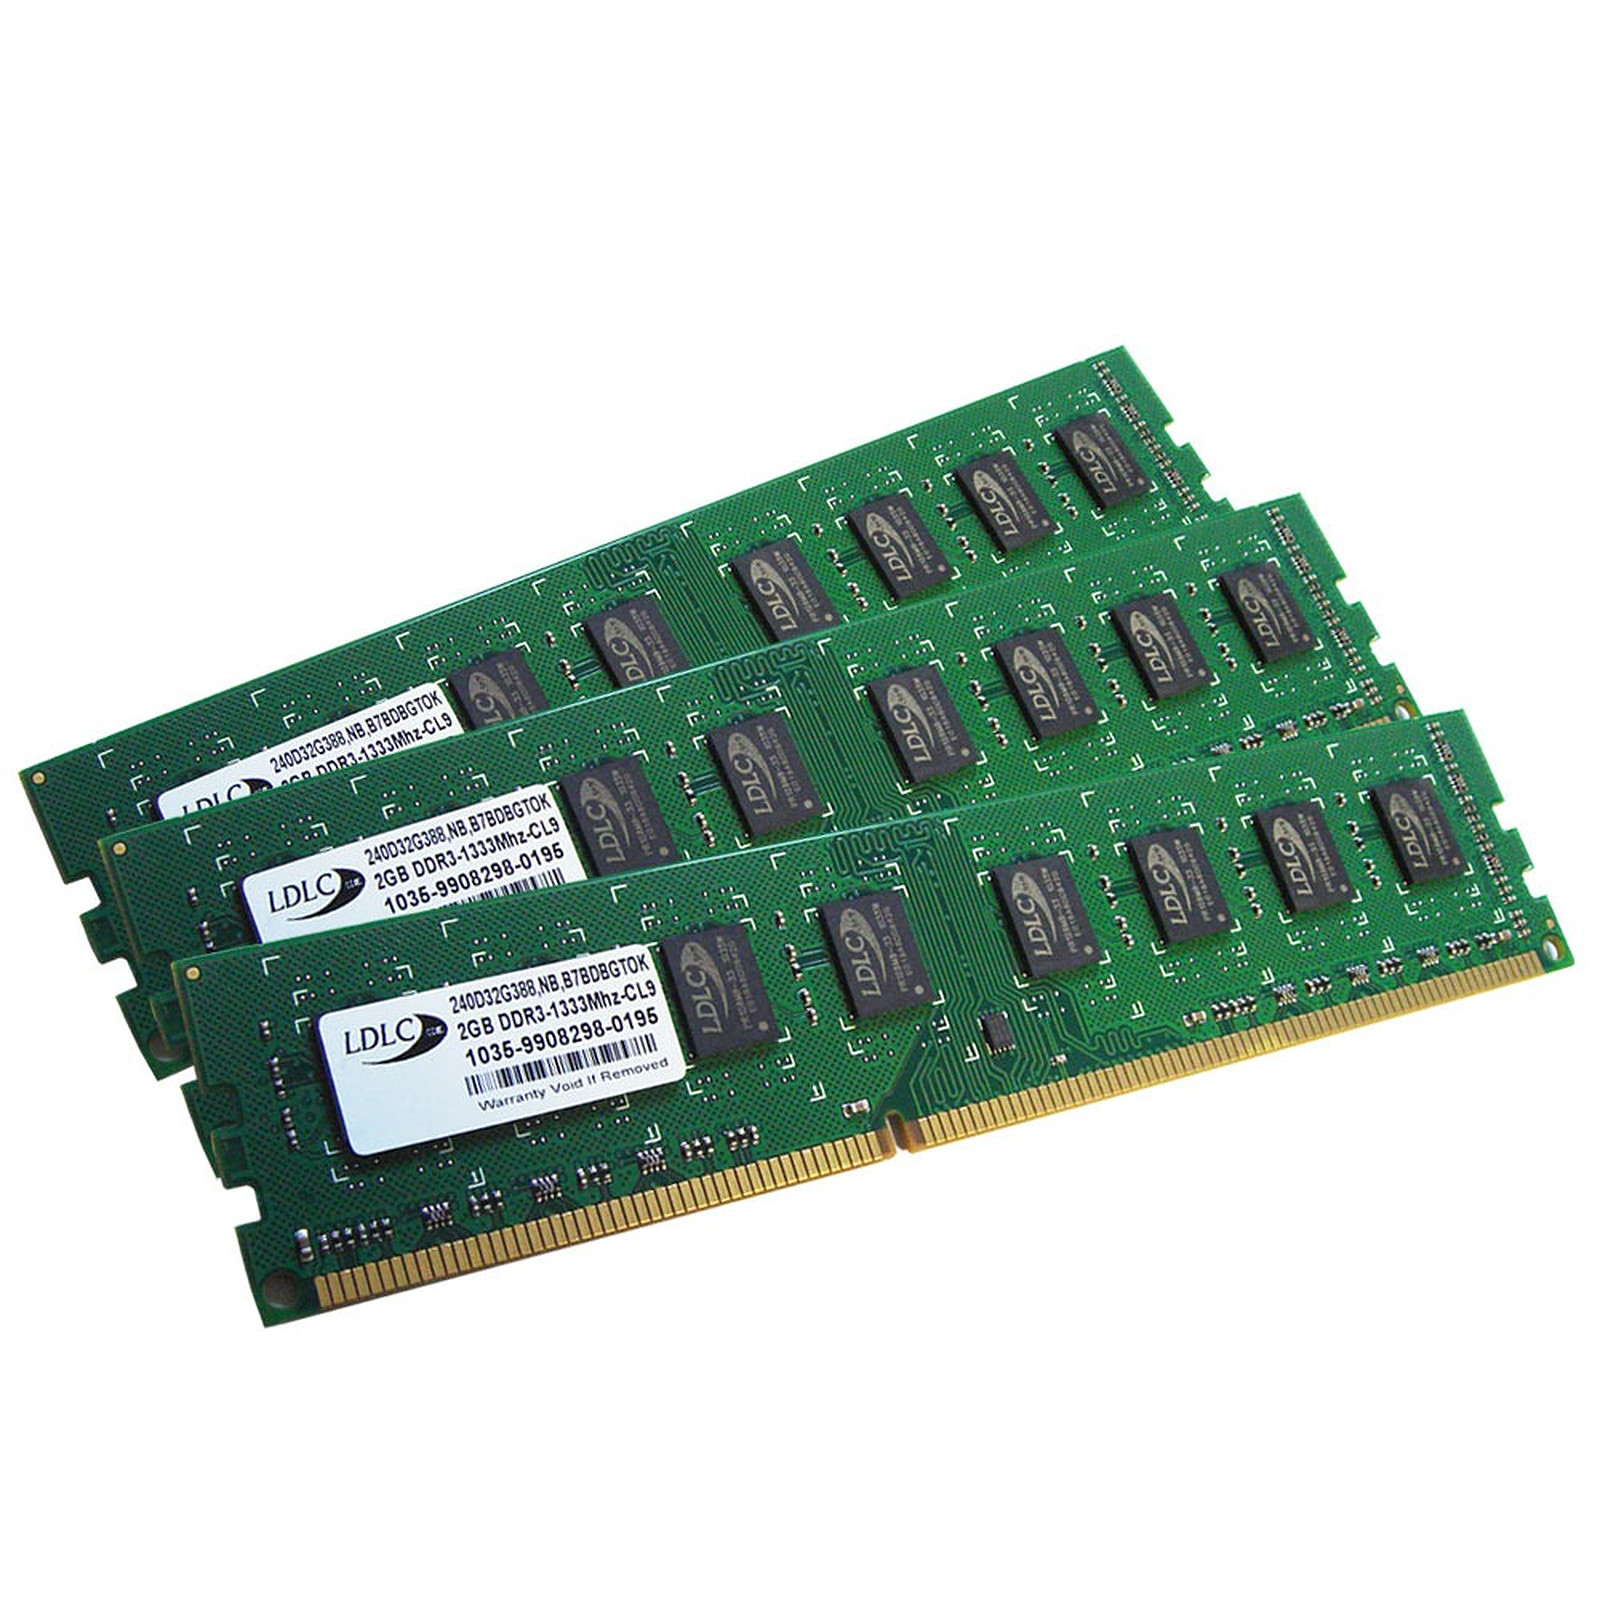 LDLC 6 Go (3x 2 Go) DDR3 1333 MHz CL9